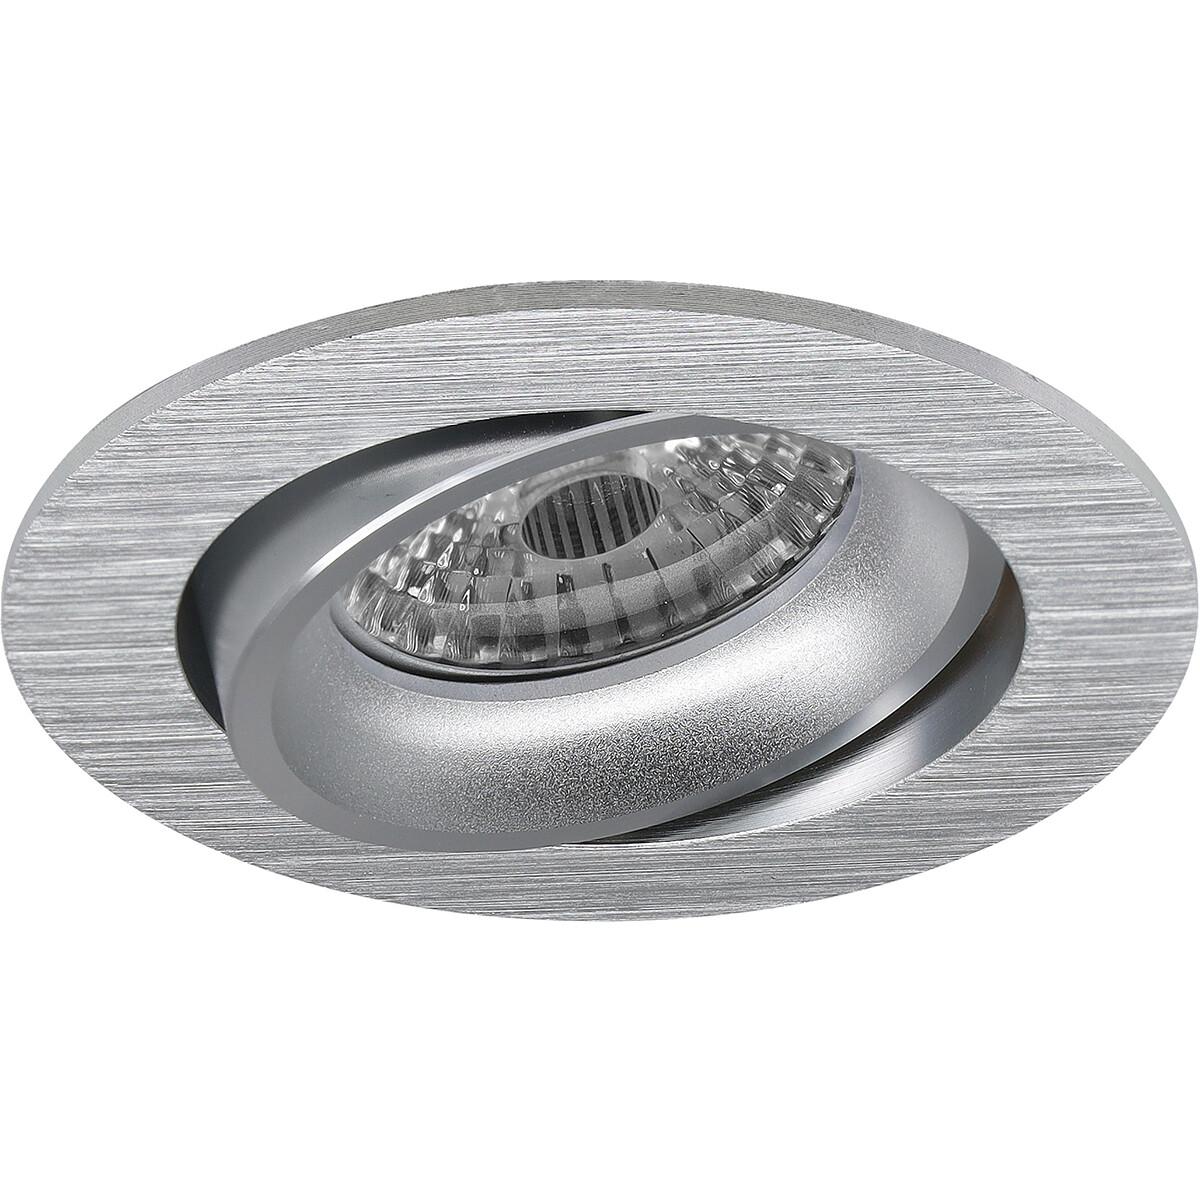 Spot Armatuur GU10 - Pragmi Delton Pro - Inbouw Rond - Mat Zilver - Aluminium - Kantelbaar - Ø82mm